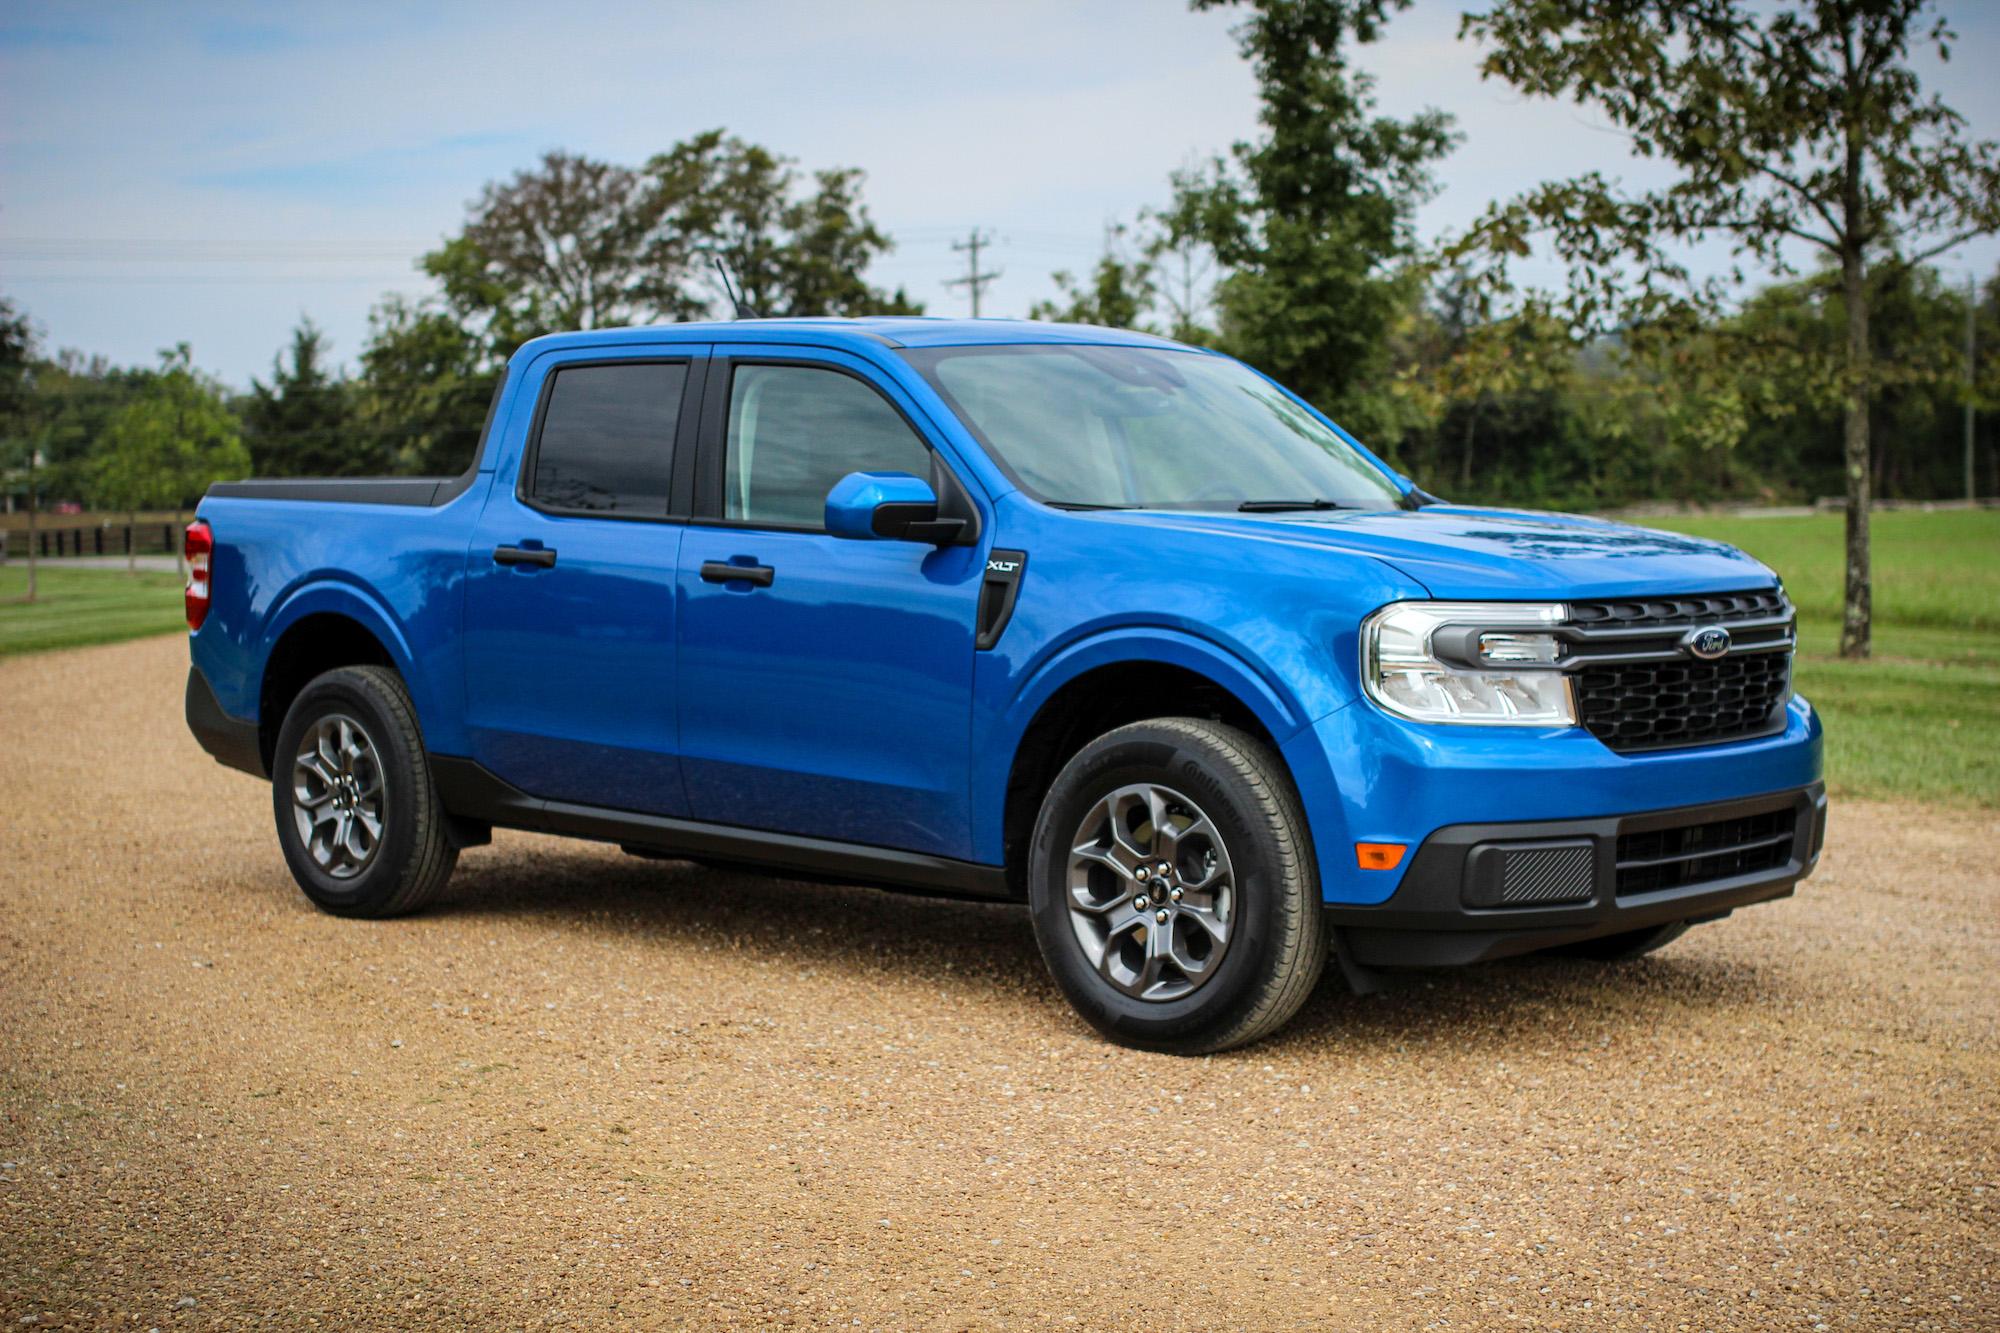 2022 ford maverick blue hybrid truck